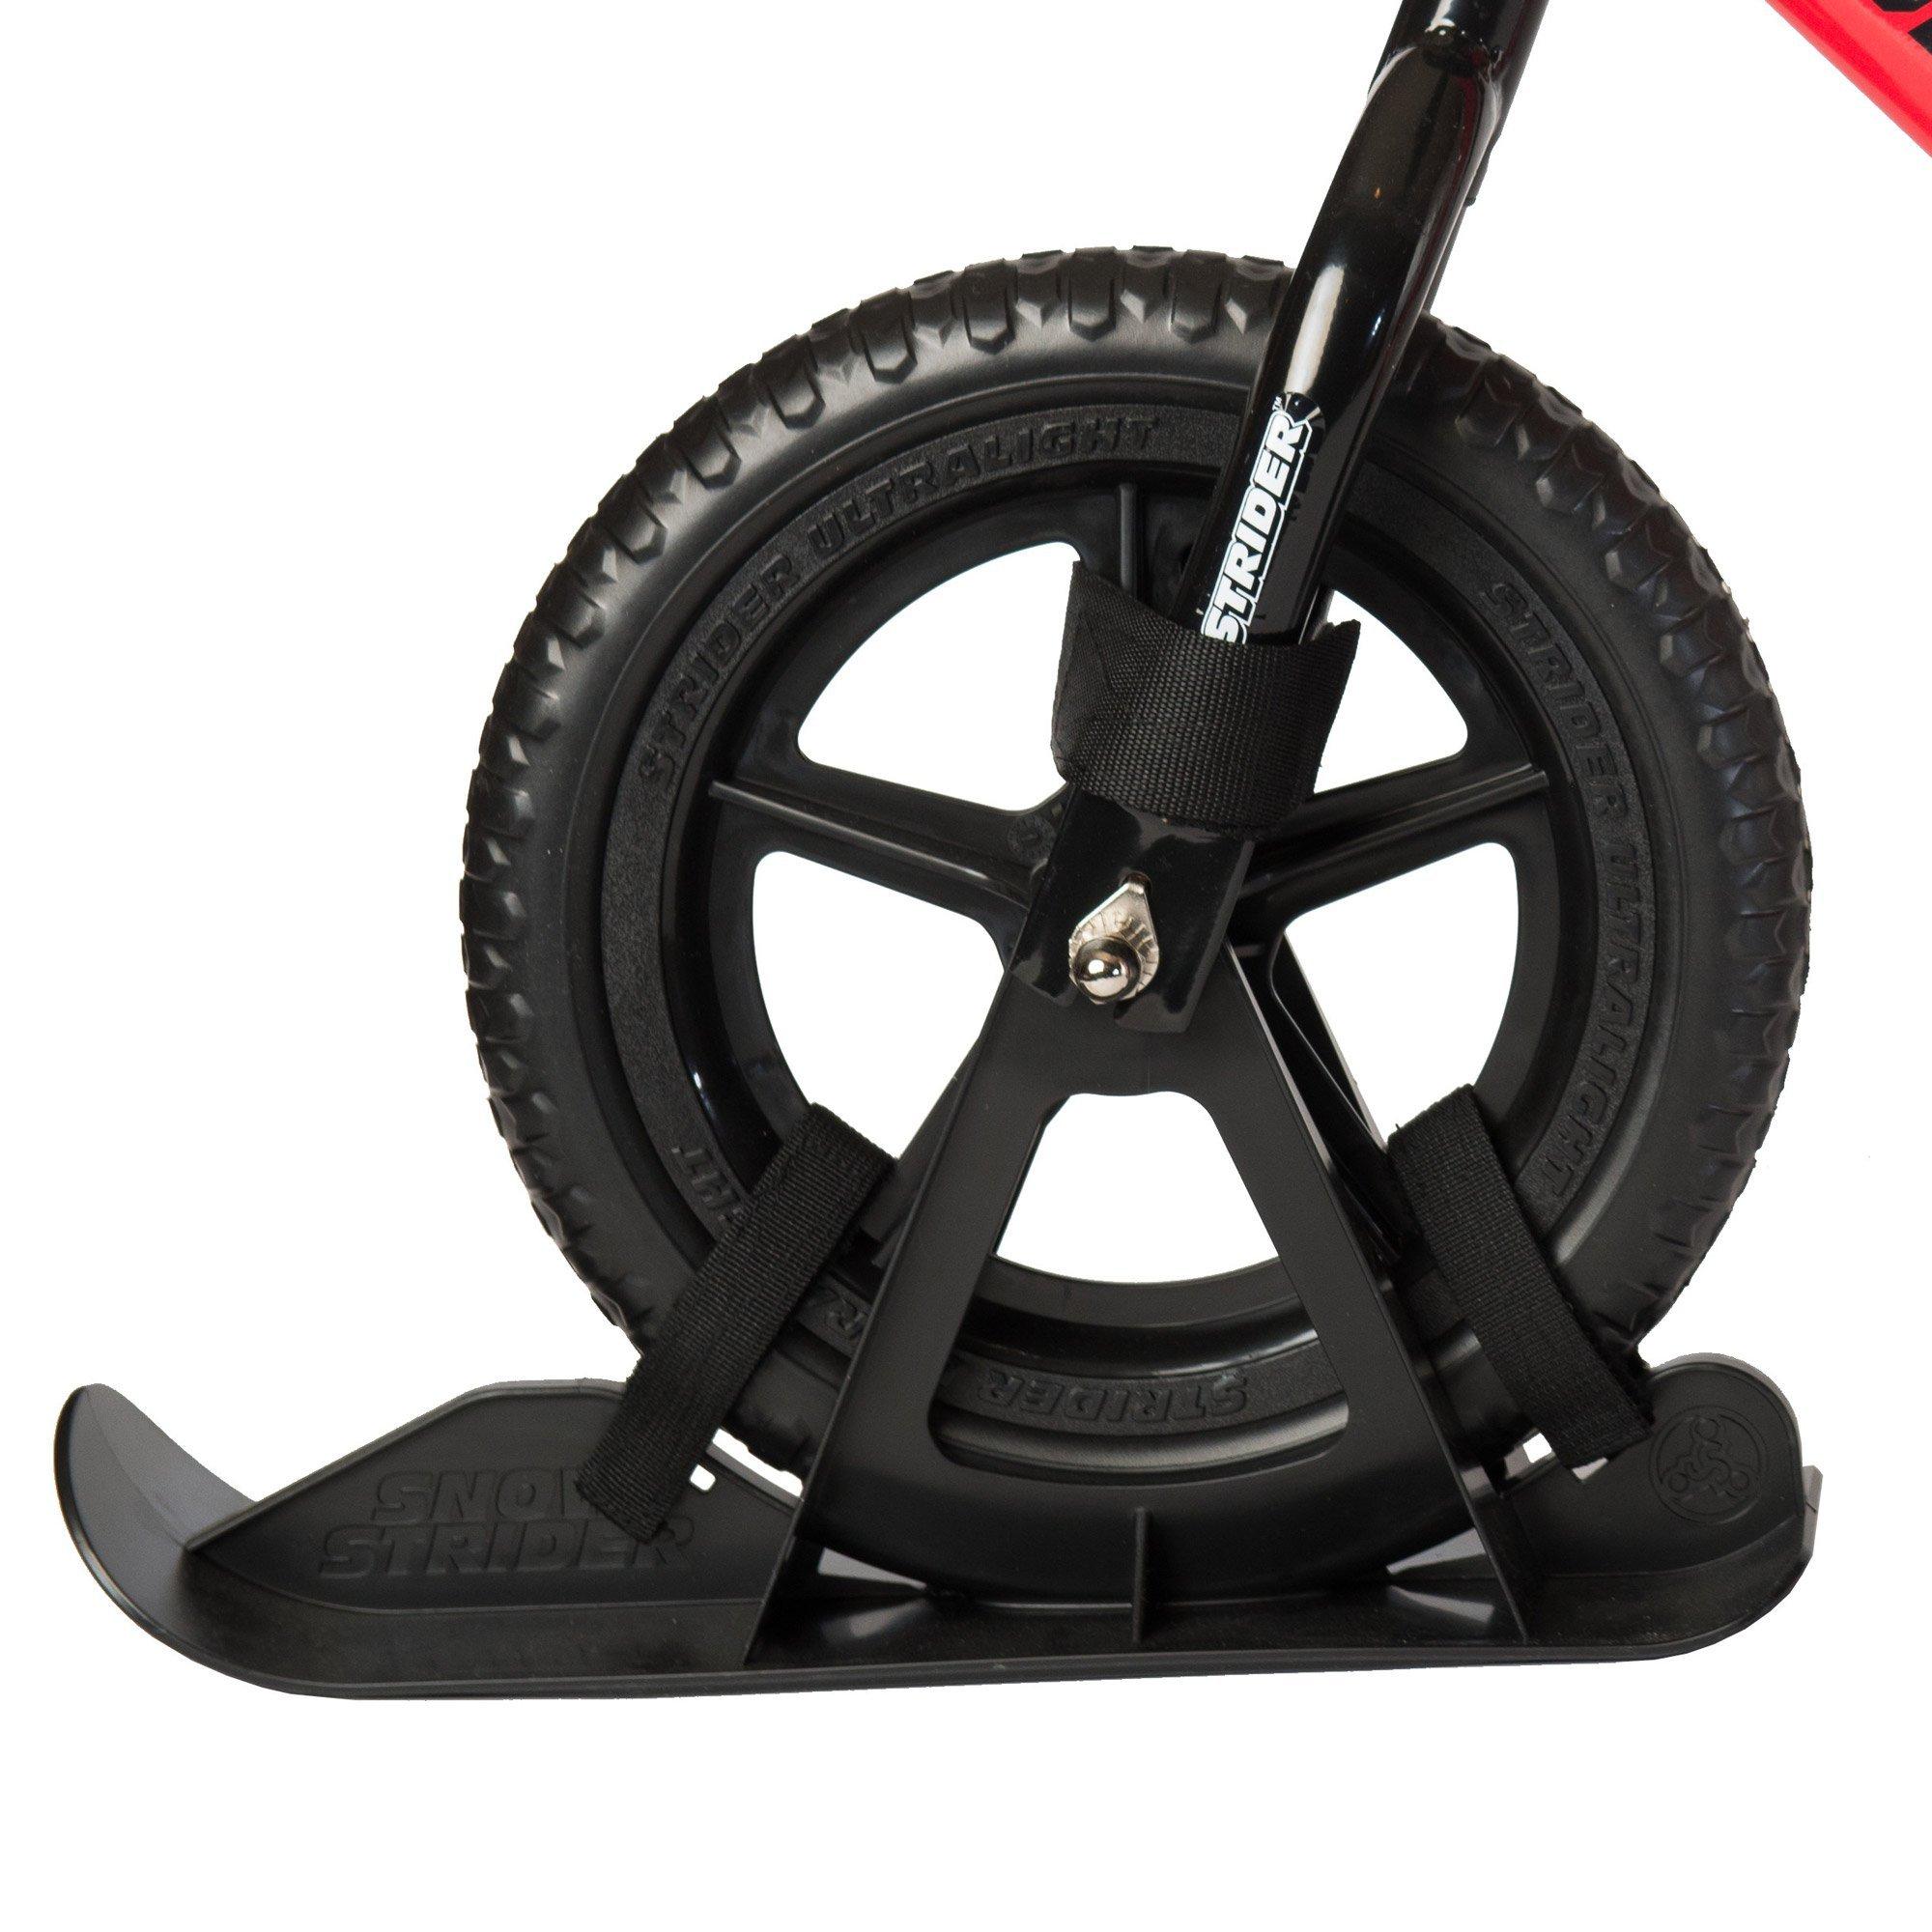 Strider Snow Ski Set for Balance Bikes by Strider (Image #3)